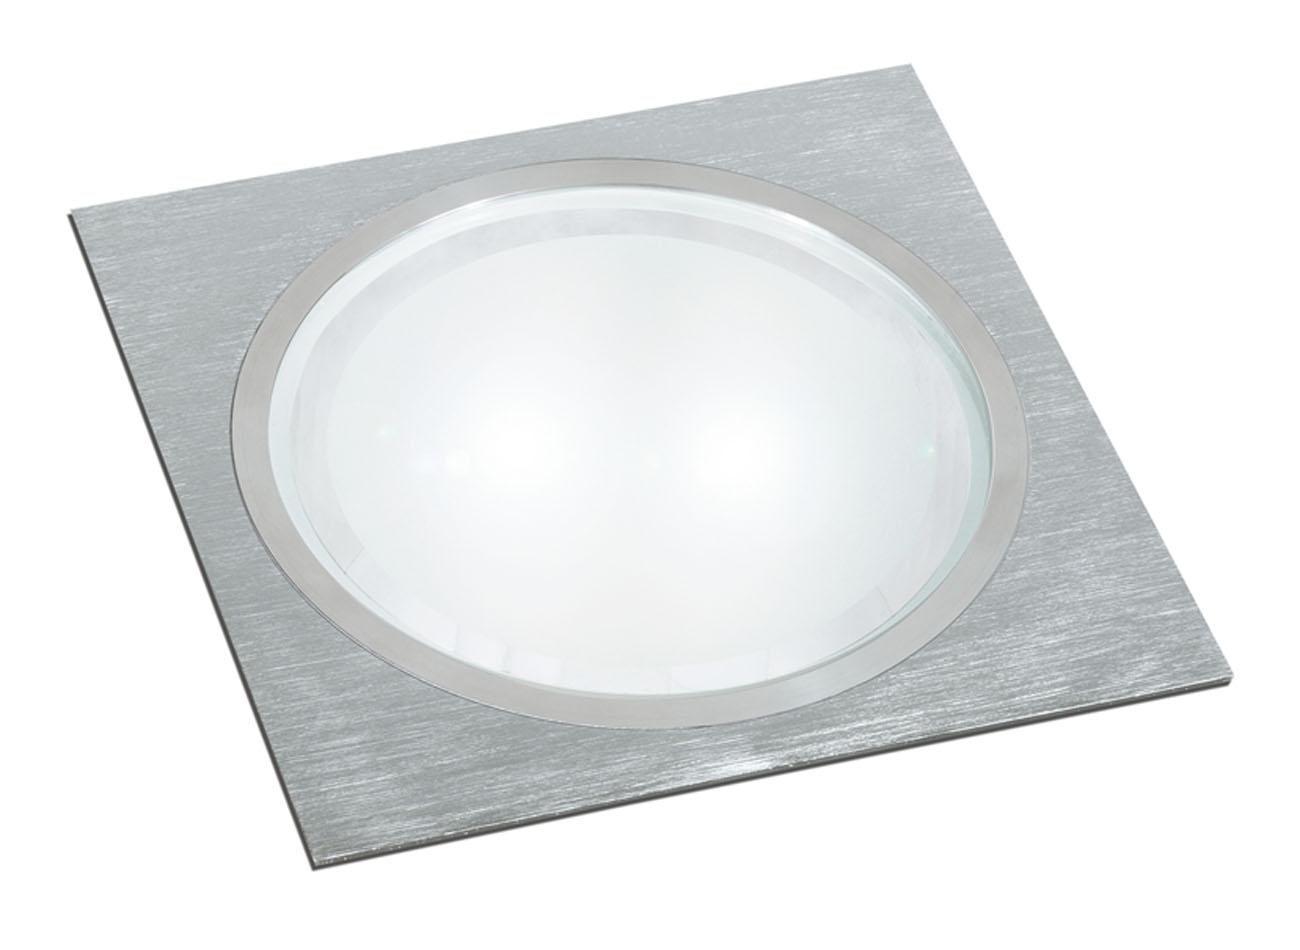 bpm lighting 3076 downlight cuadrado 2x26w g24q 3 3076. Black Bedroom Furniture Sets. Home Design Ideas